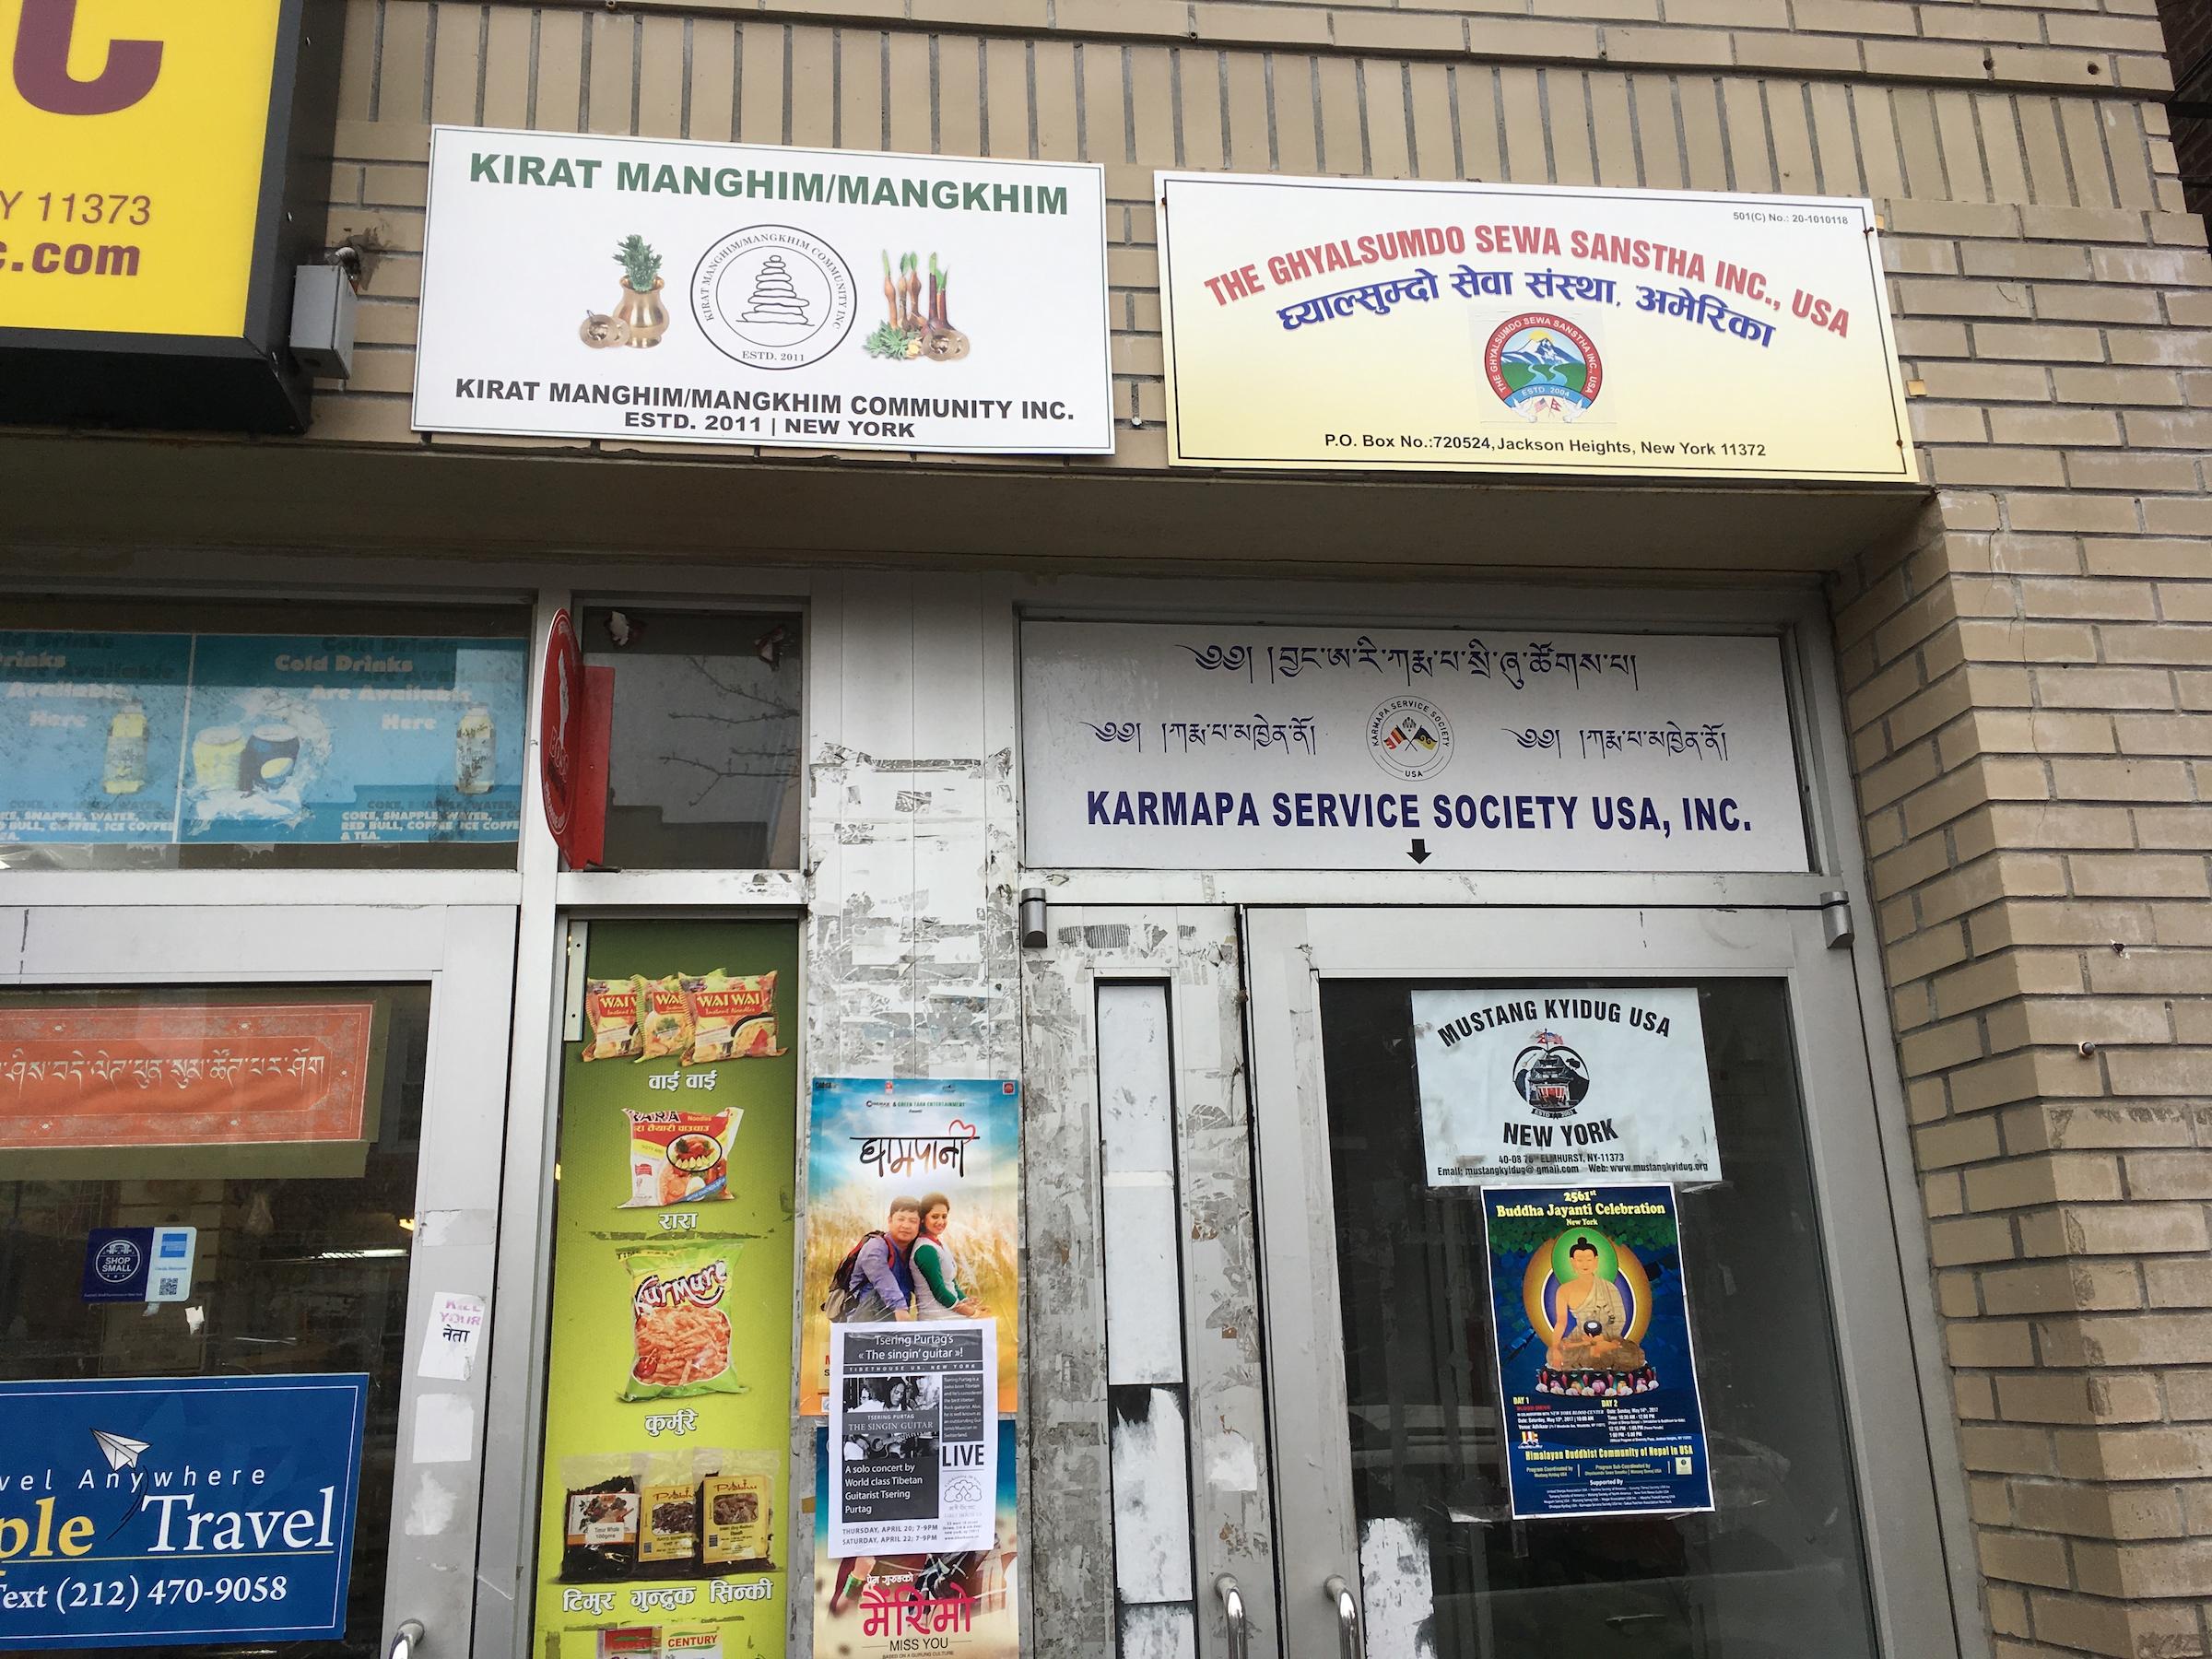 https://items.ssrc.org/wp-content/uploads/2021/06/Kyidug-Central.jpg